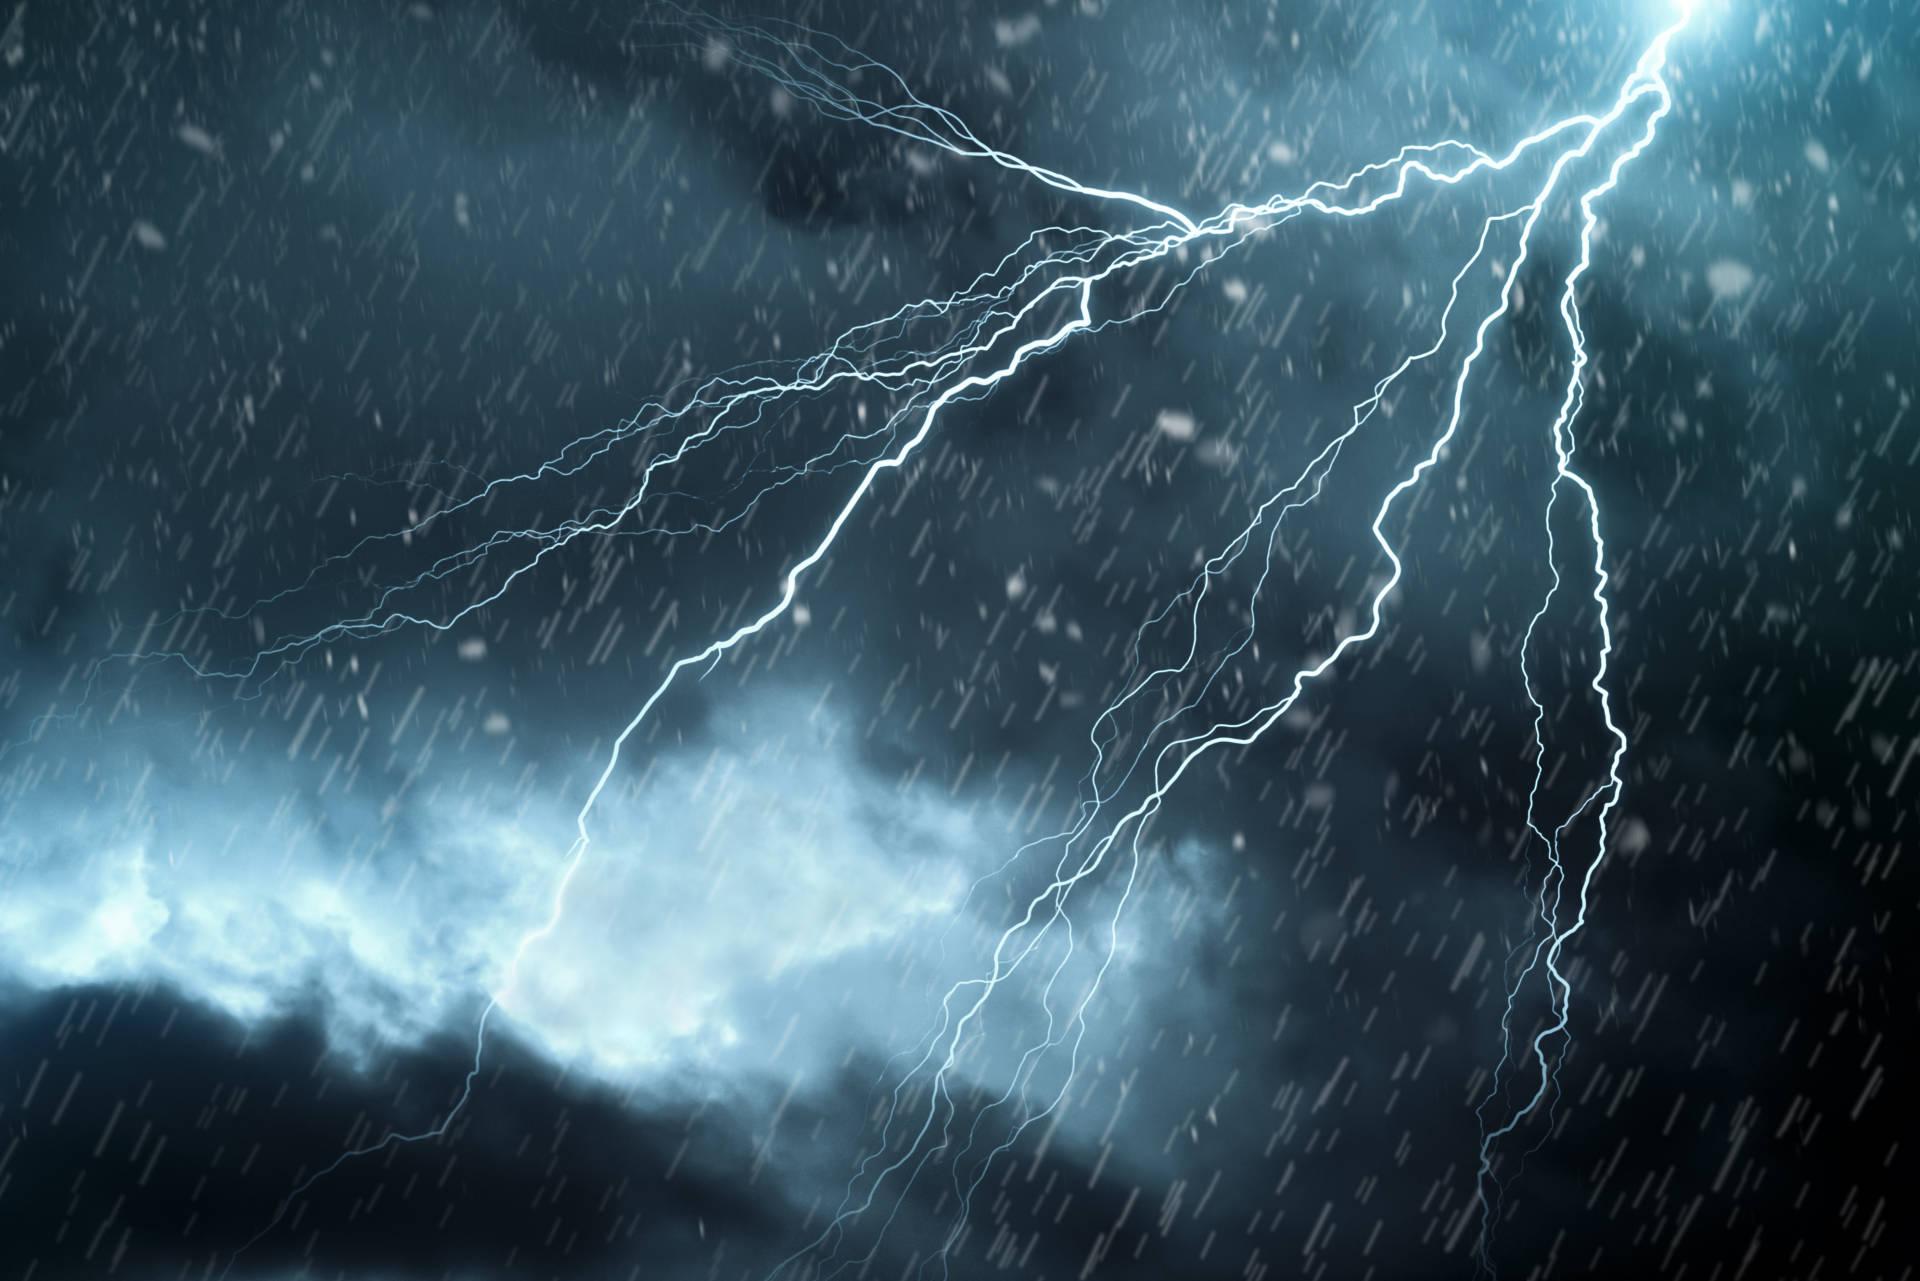 Cooler weather dampens demand IMAGE